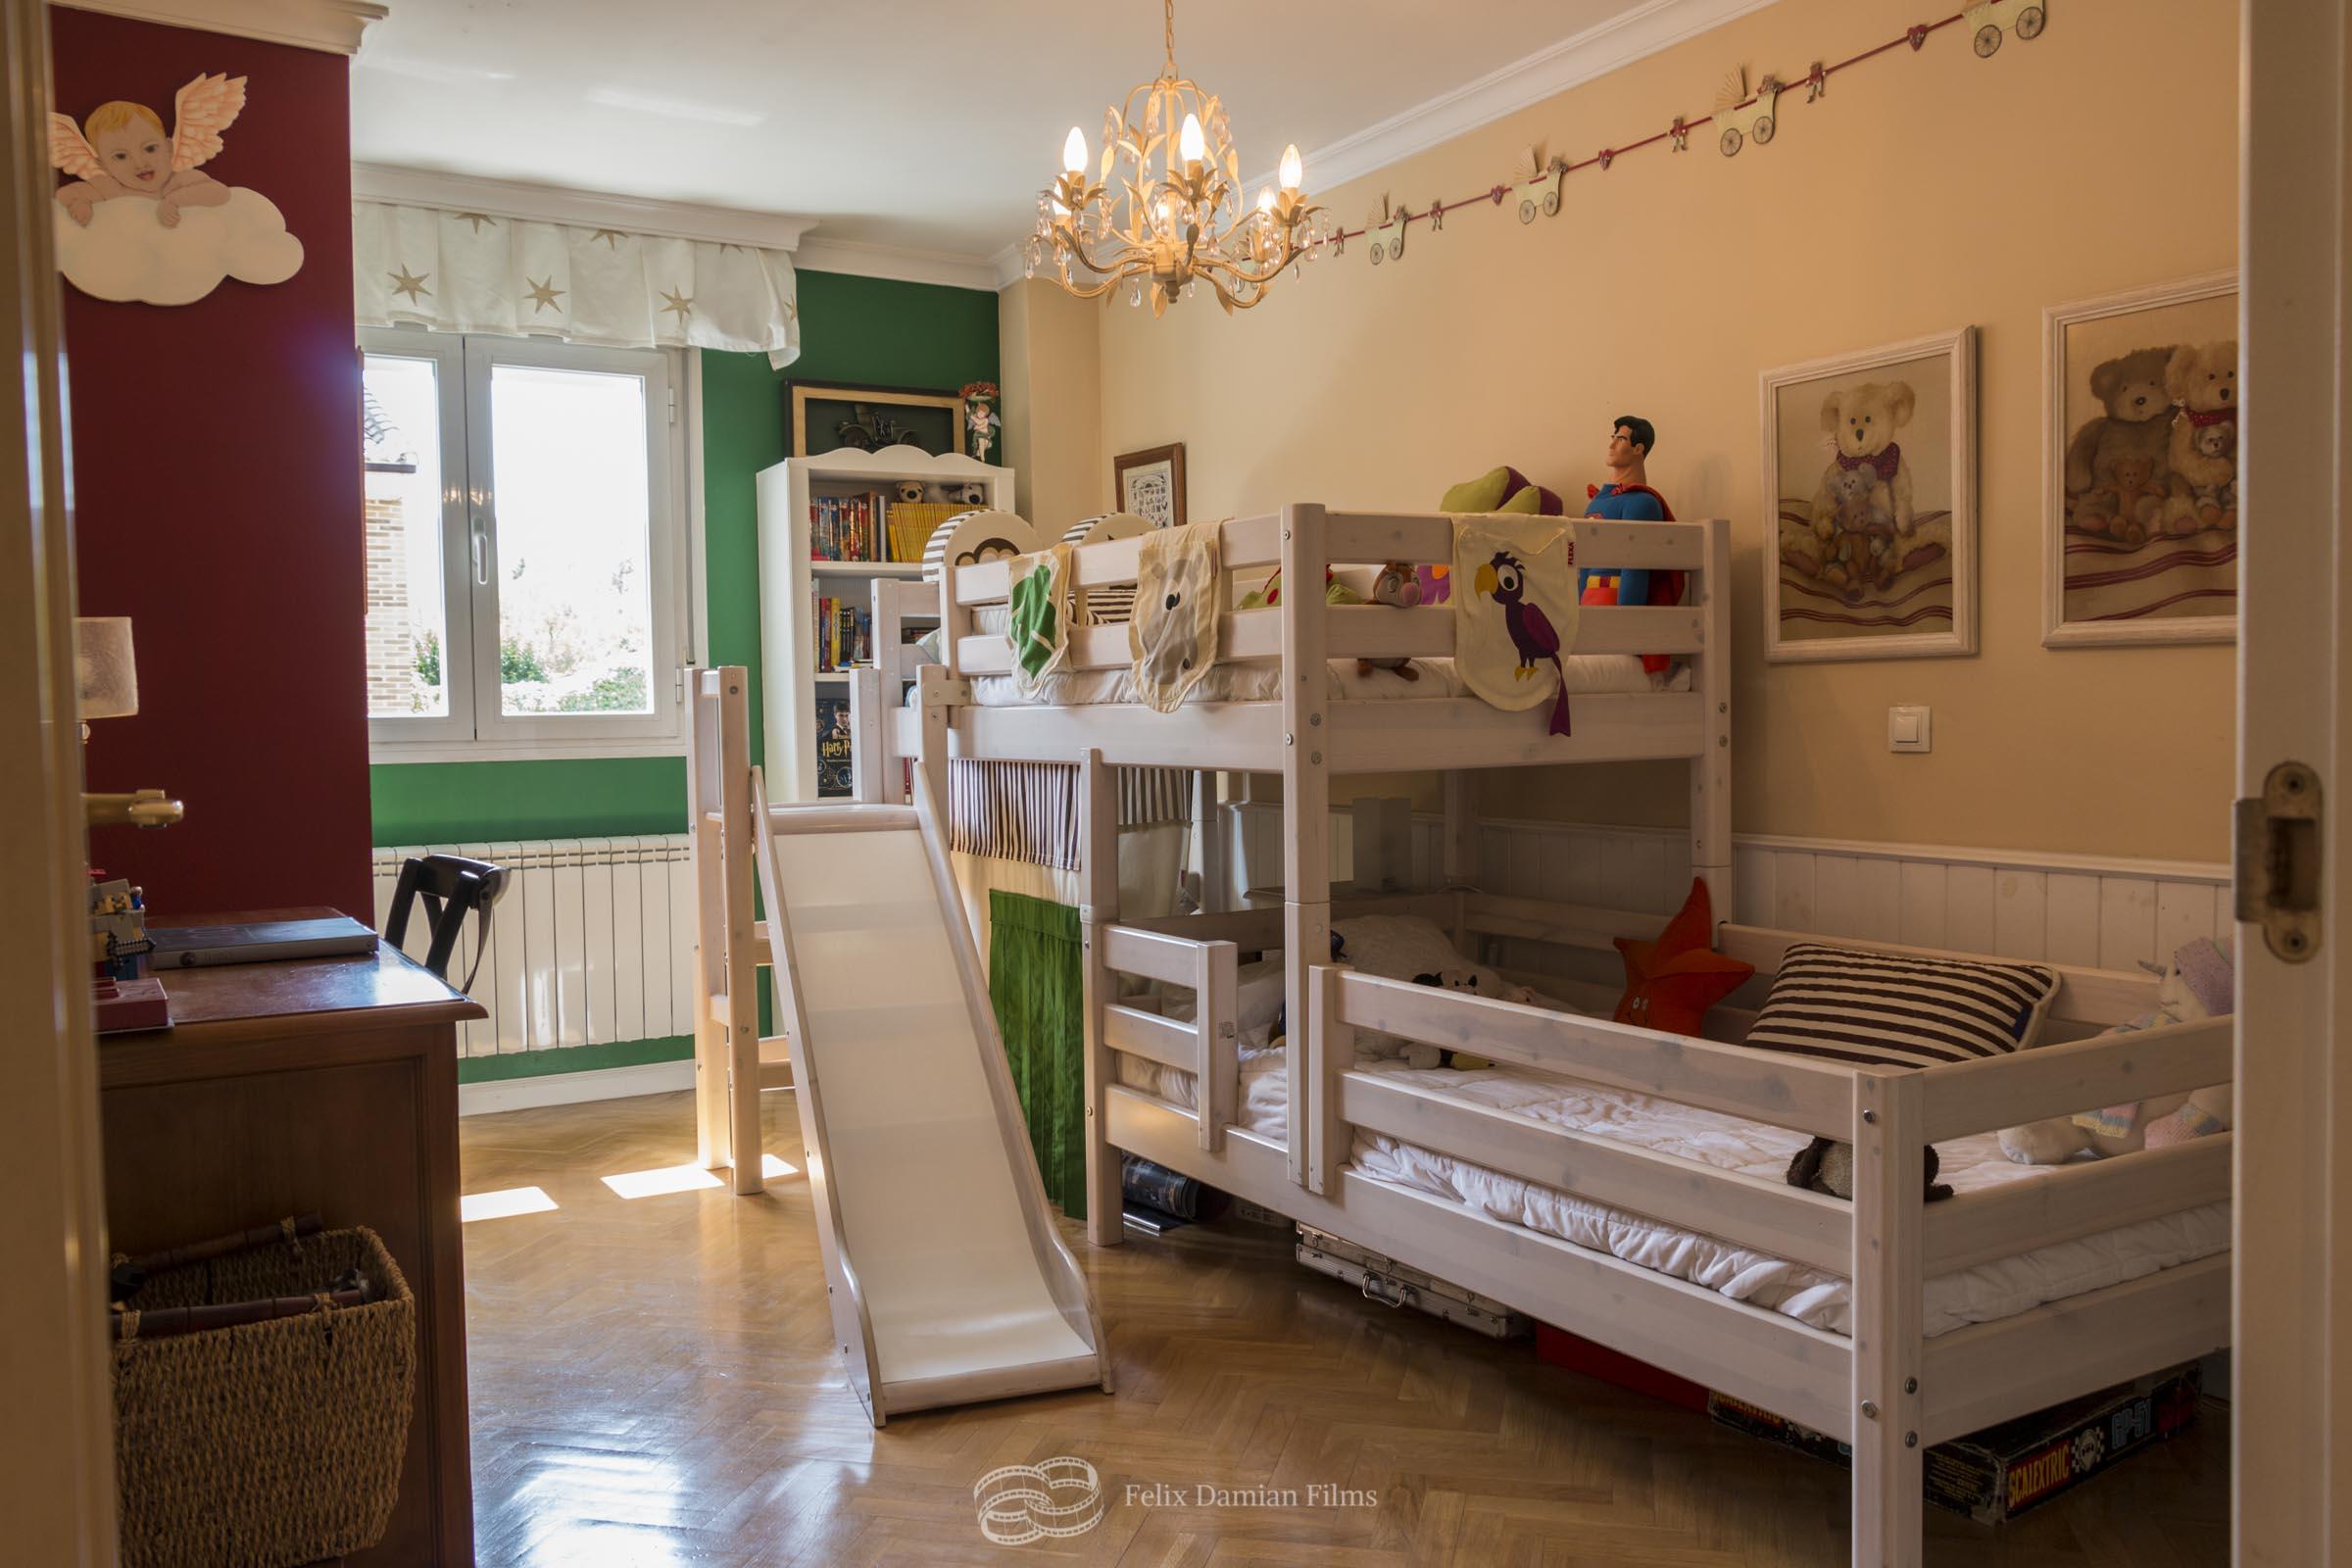 real estate fotografo de interiores madrid-19